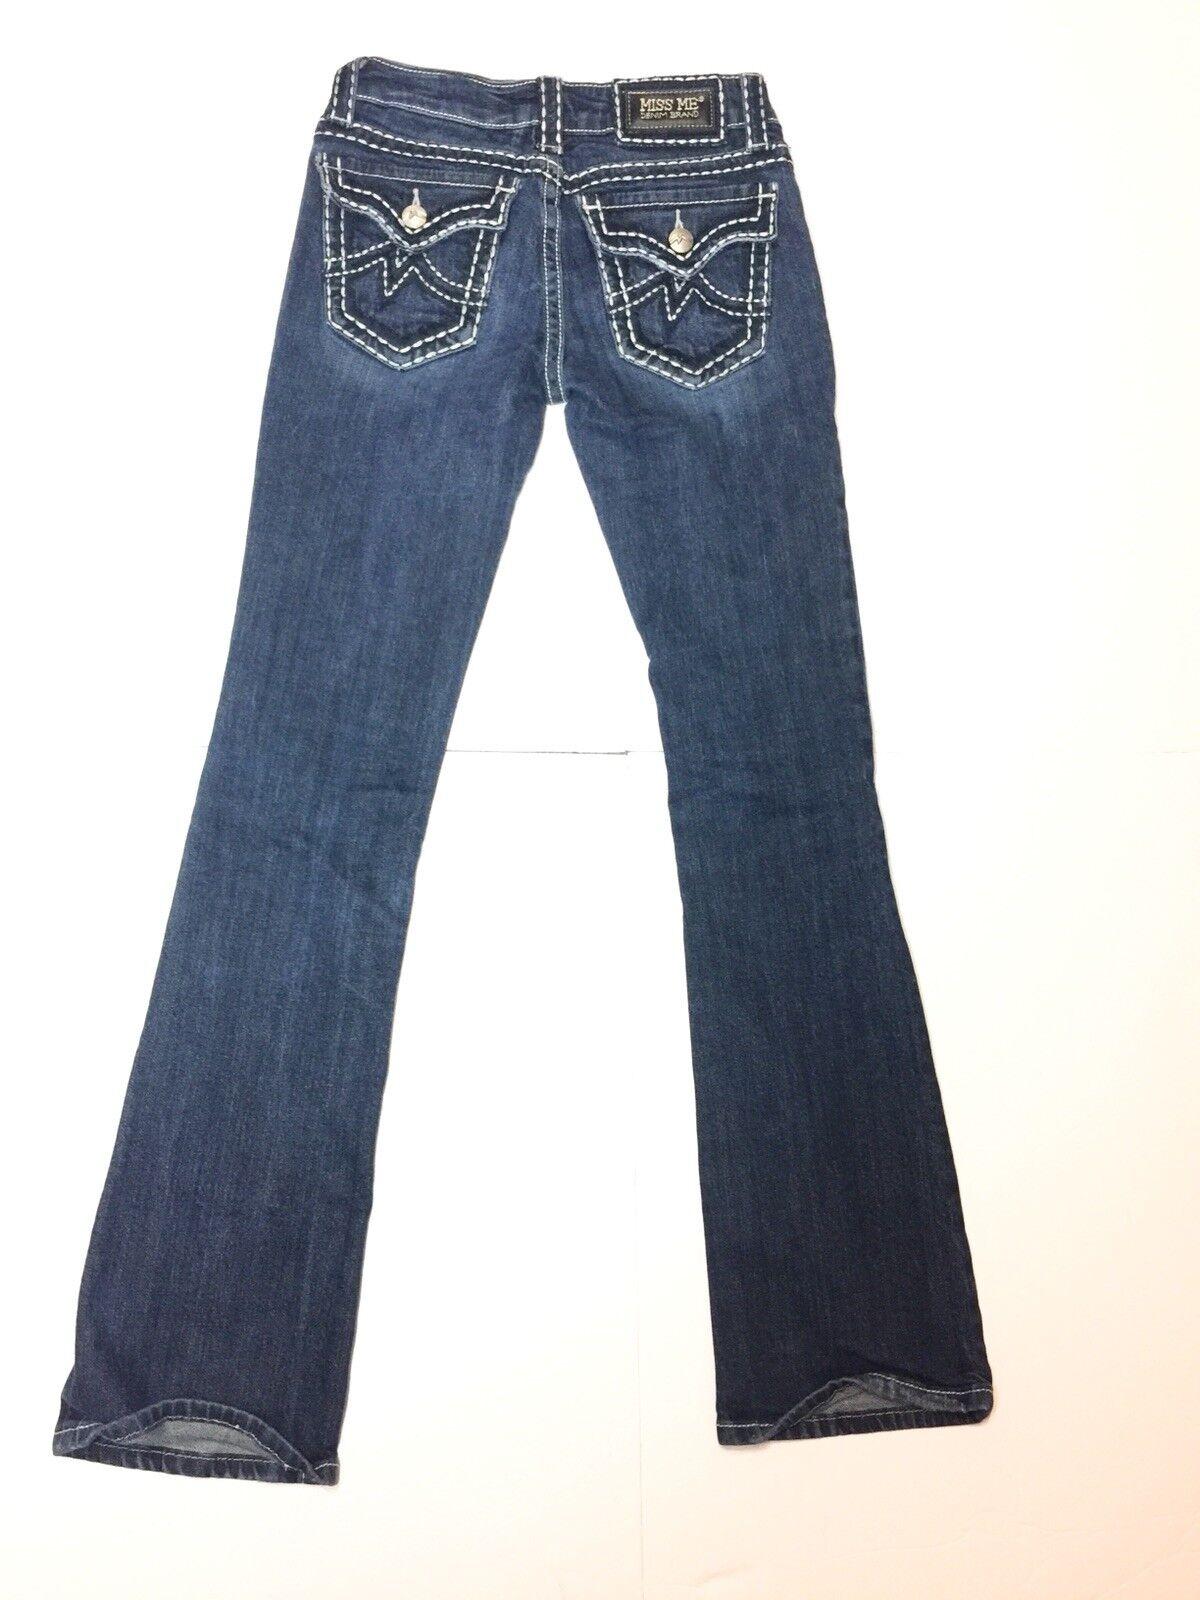 Miss Me Irene Bootcut Jeans Size 27 Medium Wash - Inseam 31